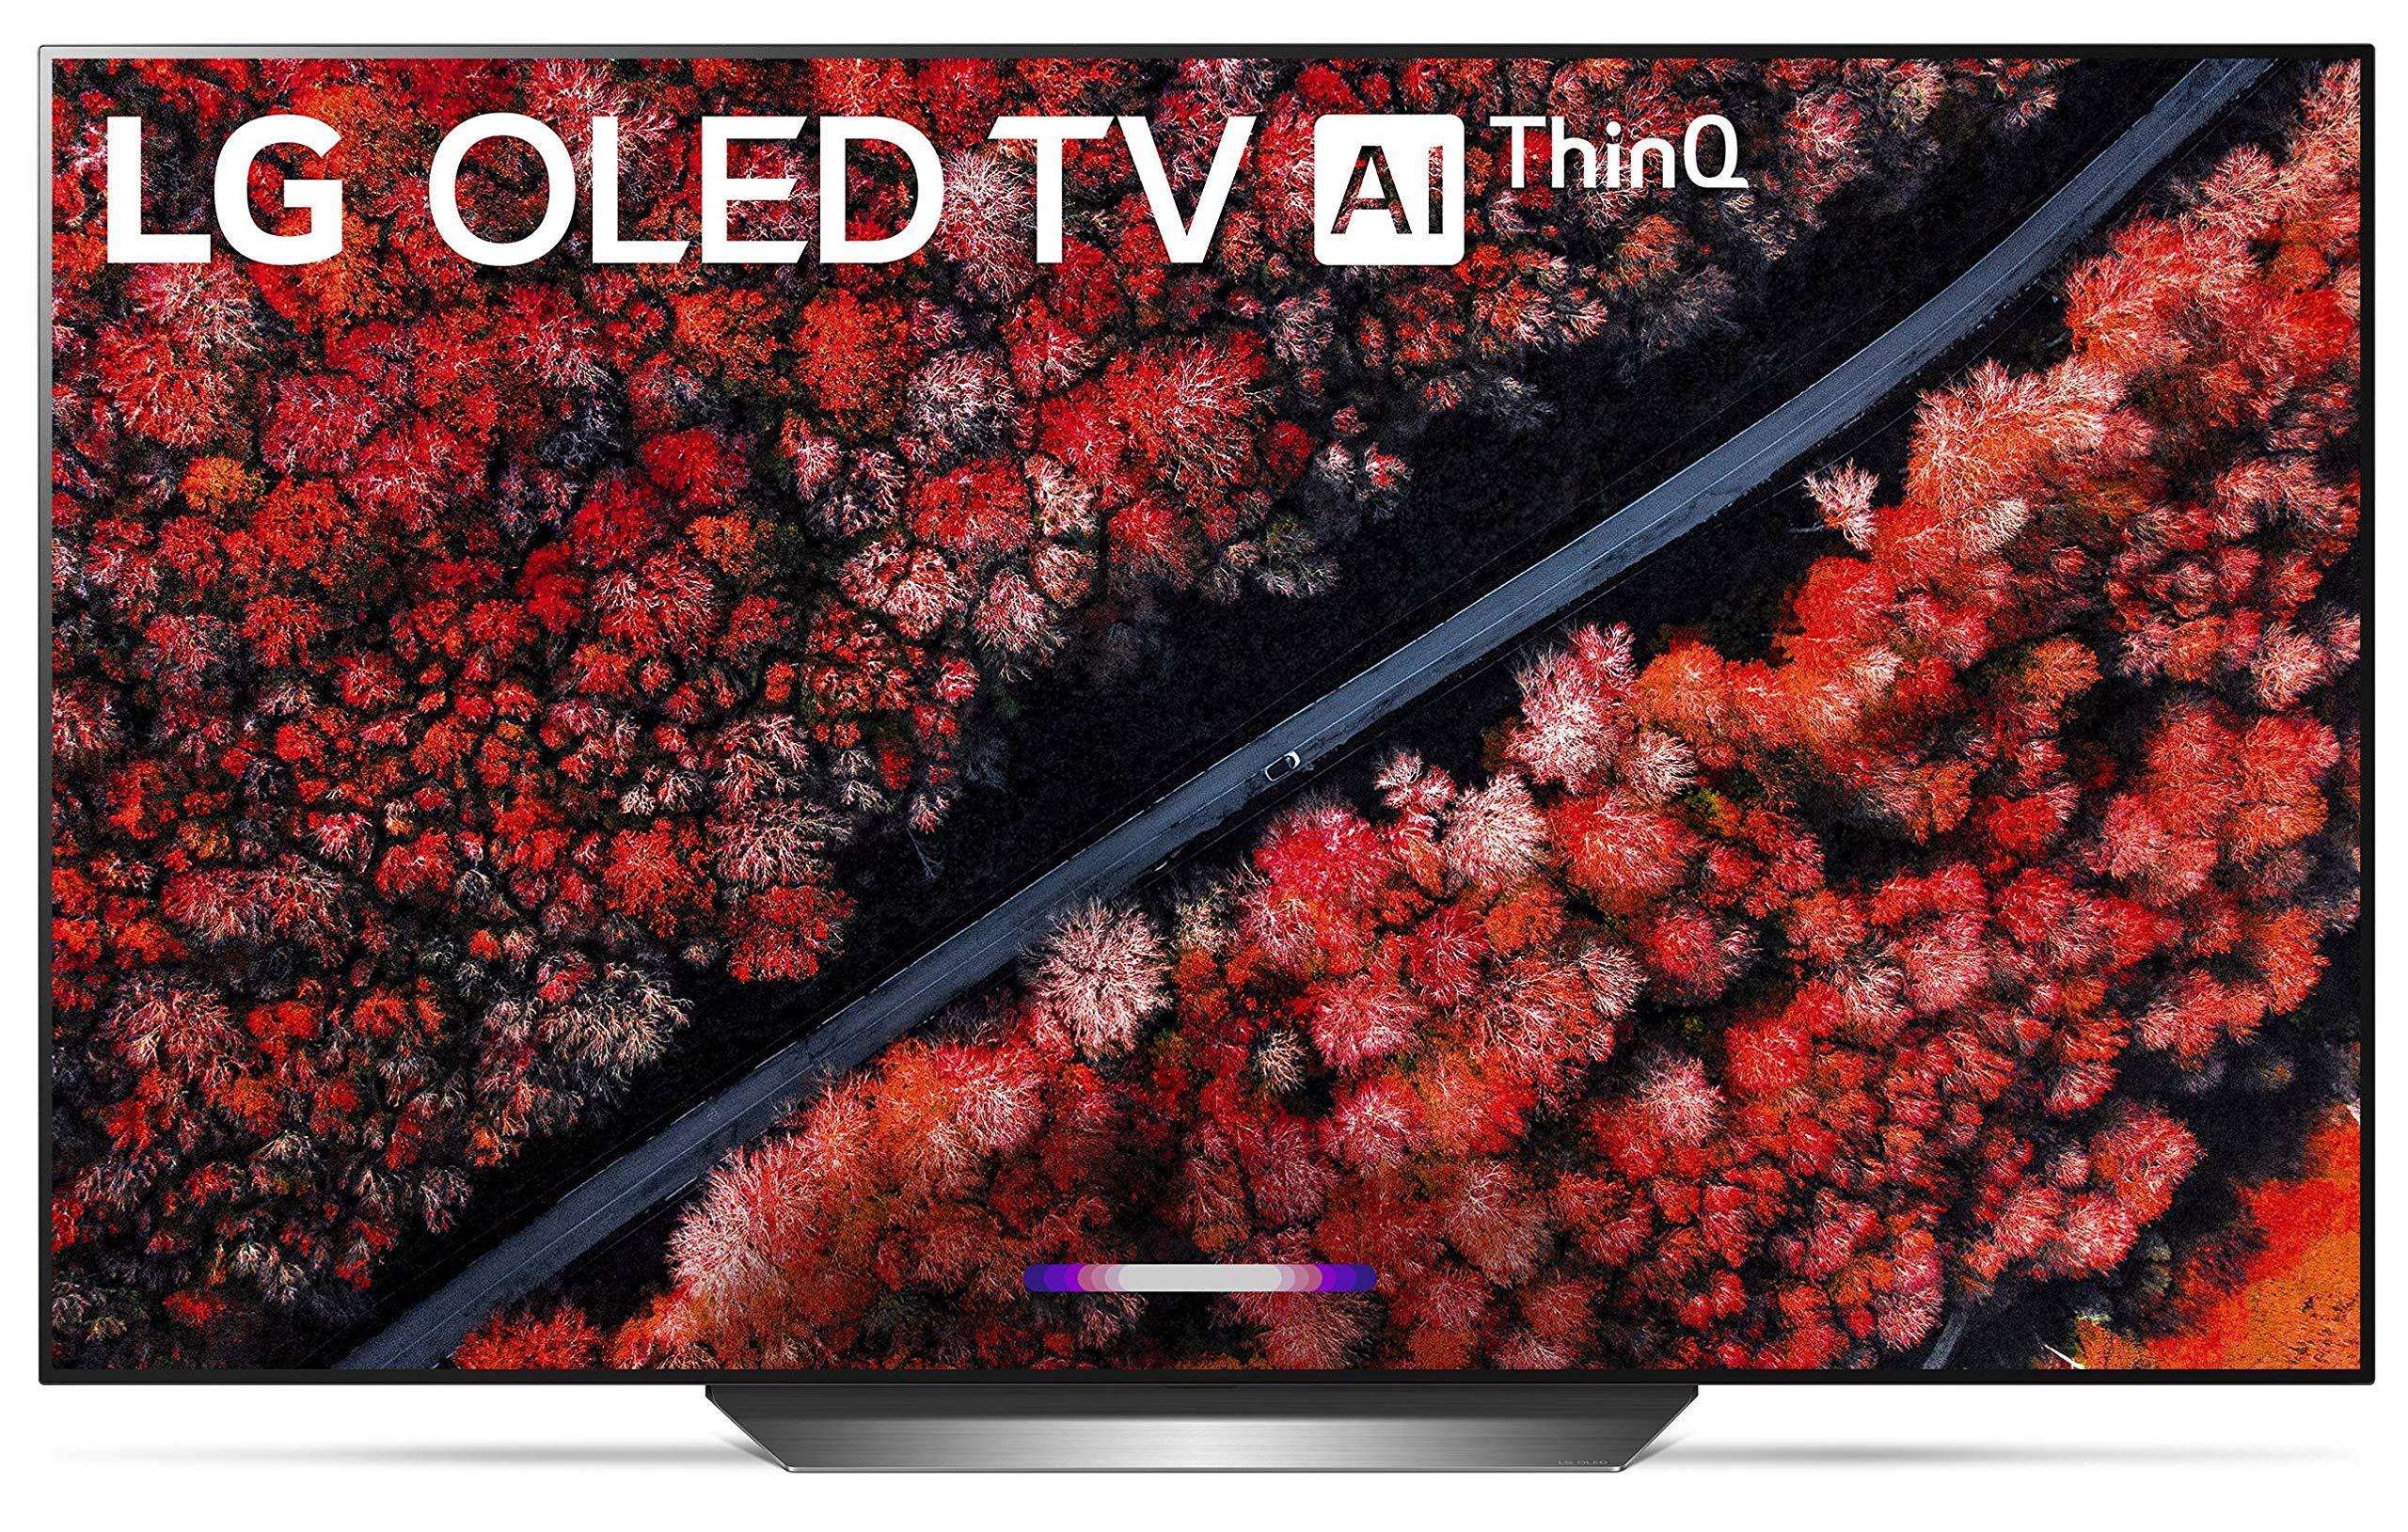 Amazon.com: LG C9 Series Smart OLED TV - 77